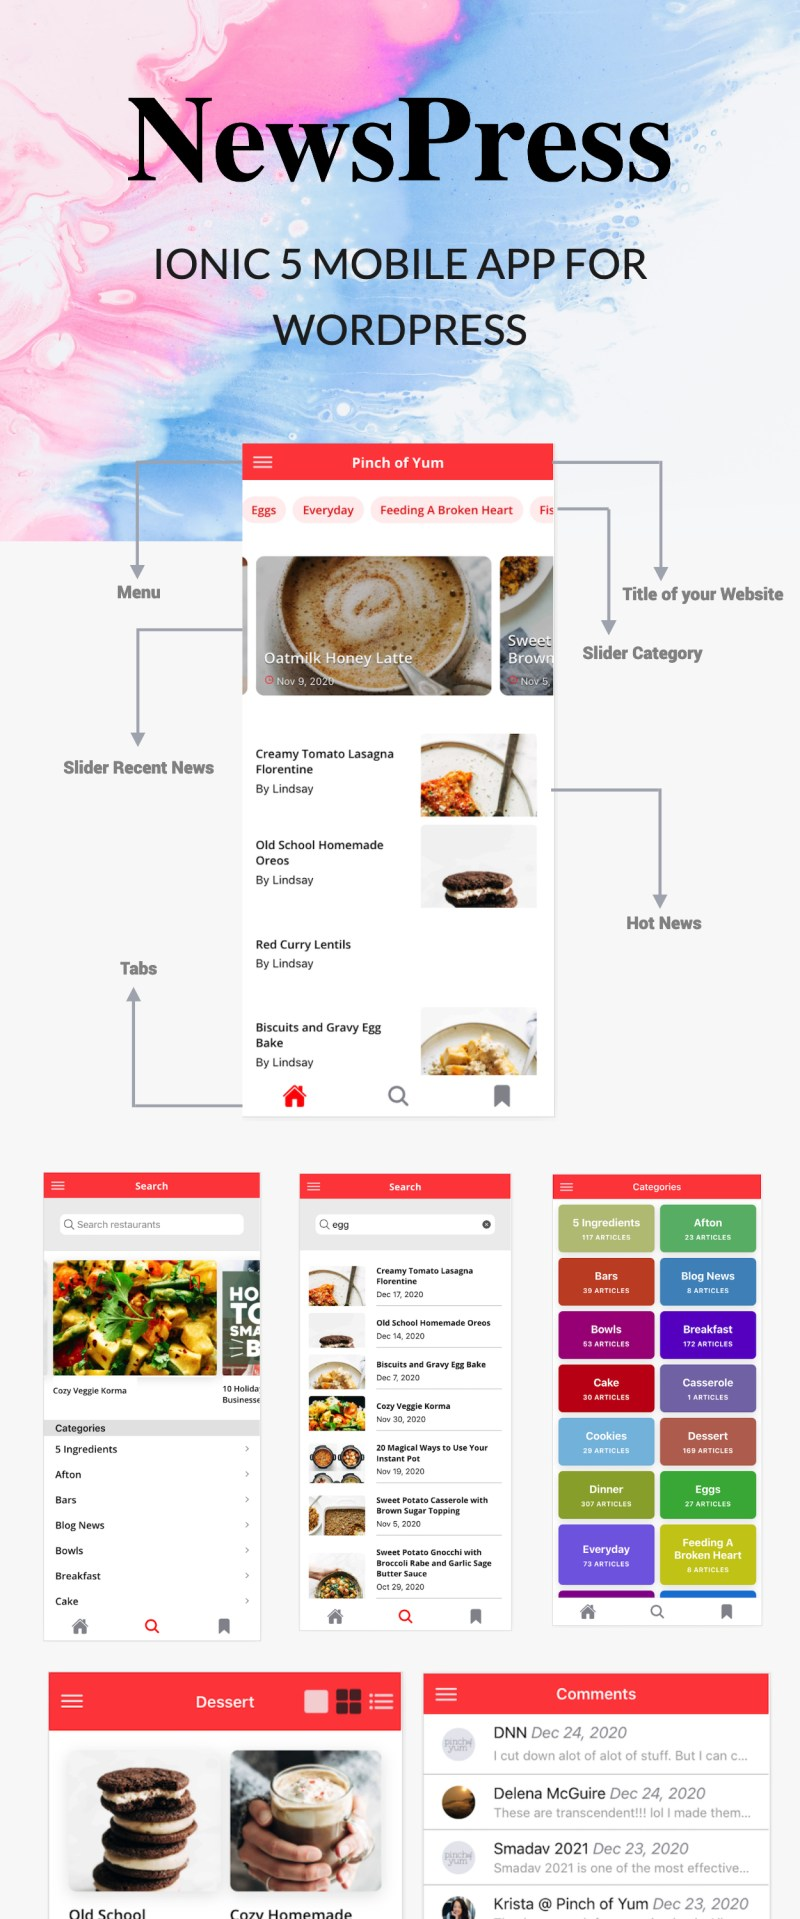 NewsPress - Ionic 5 mobile app for WordPress - 5